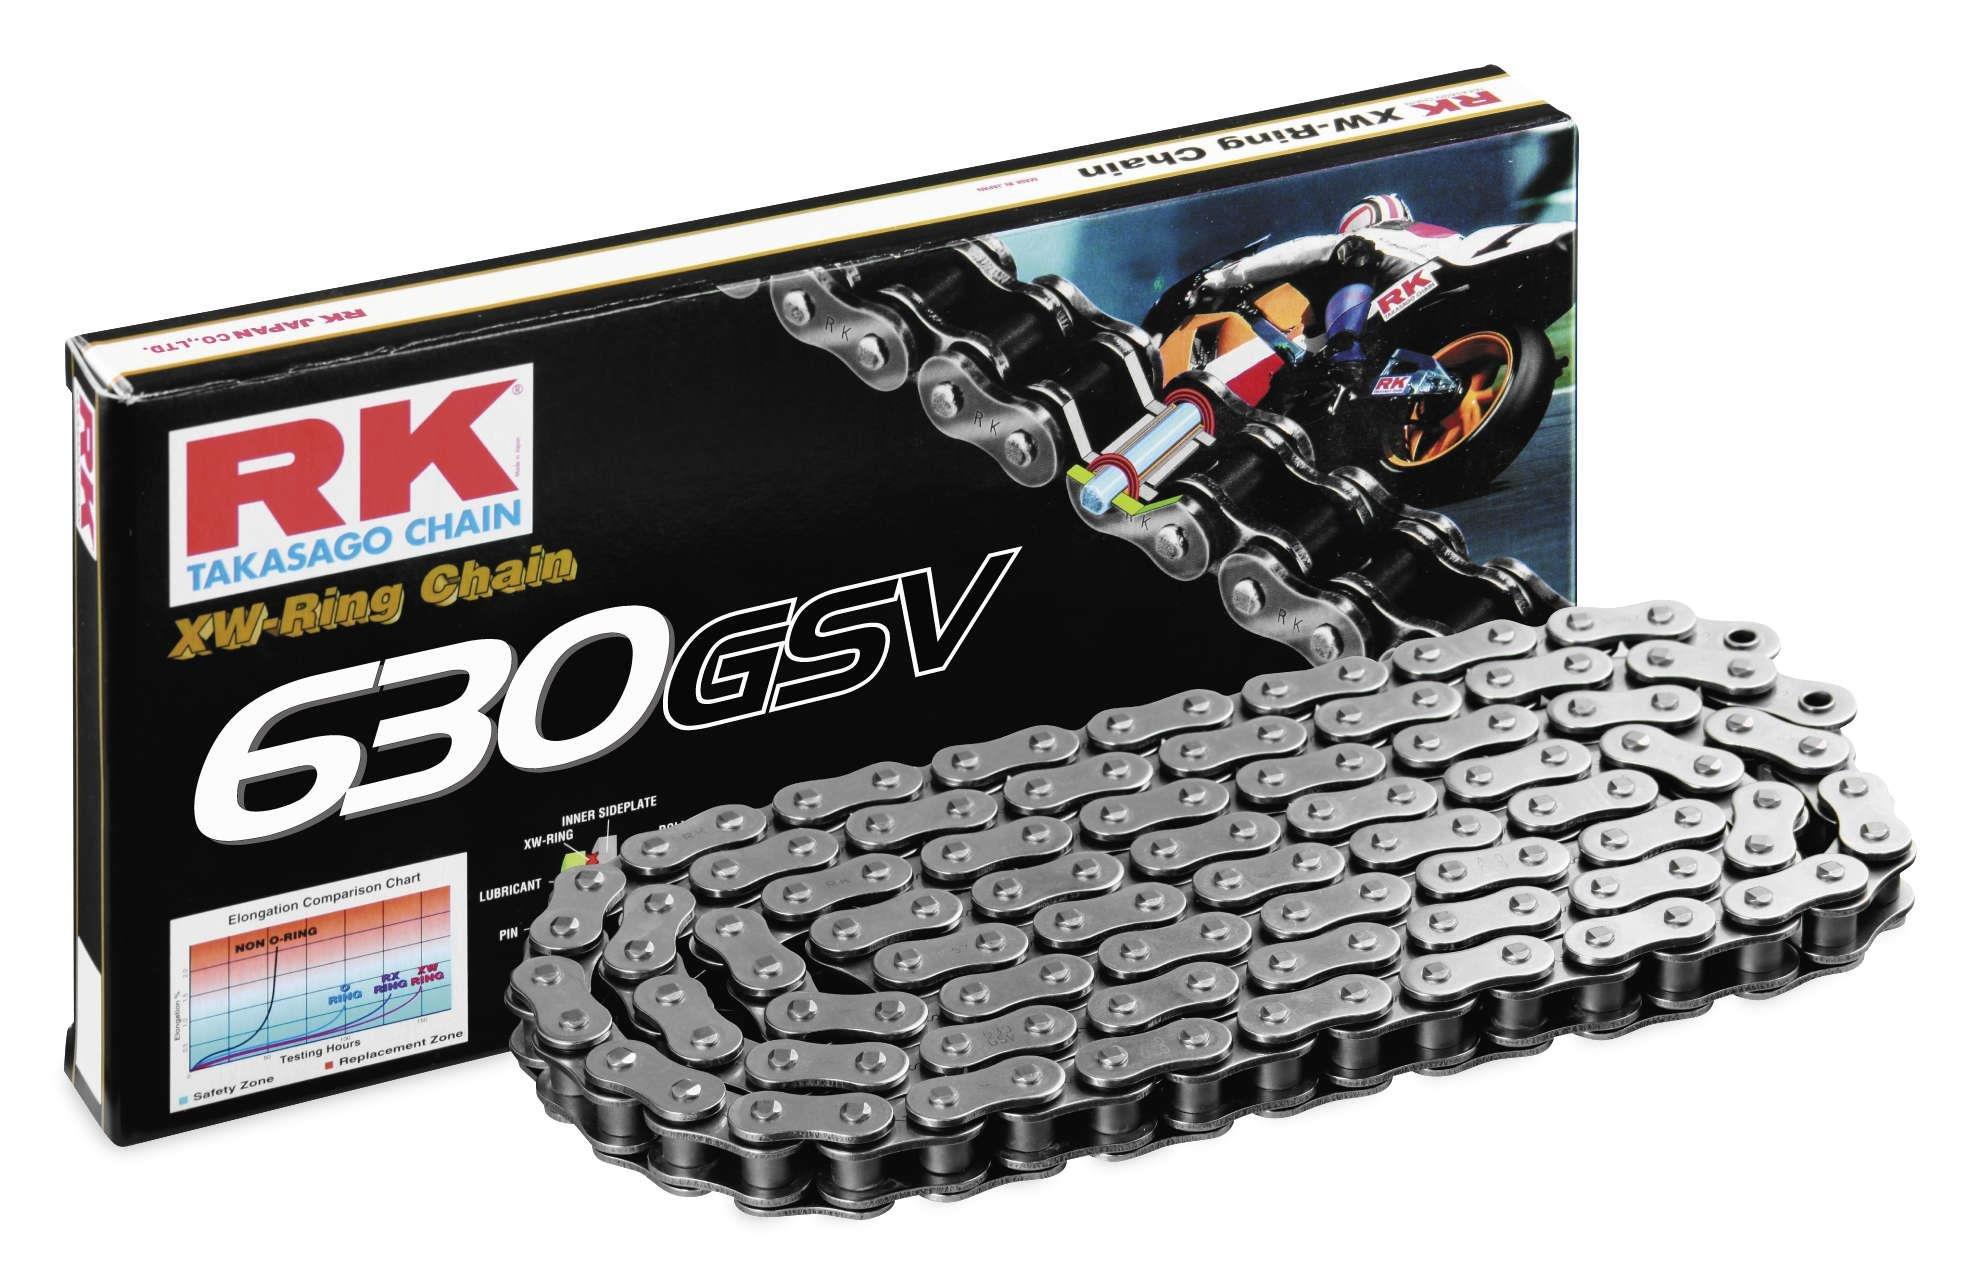 RK Racing Chain 630GSV-110 '110-Links' Ultra High-Performance XW-Ring Sport Bike Motorcycle Chain